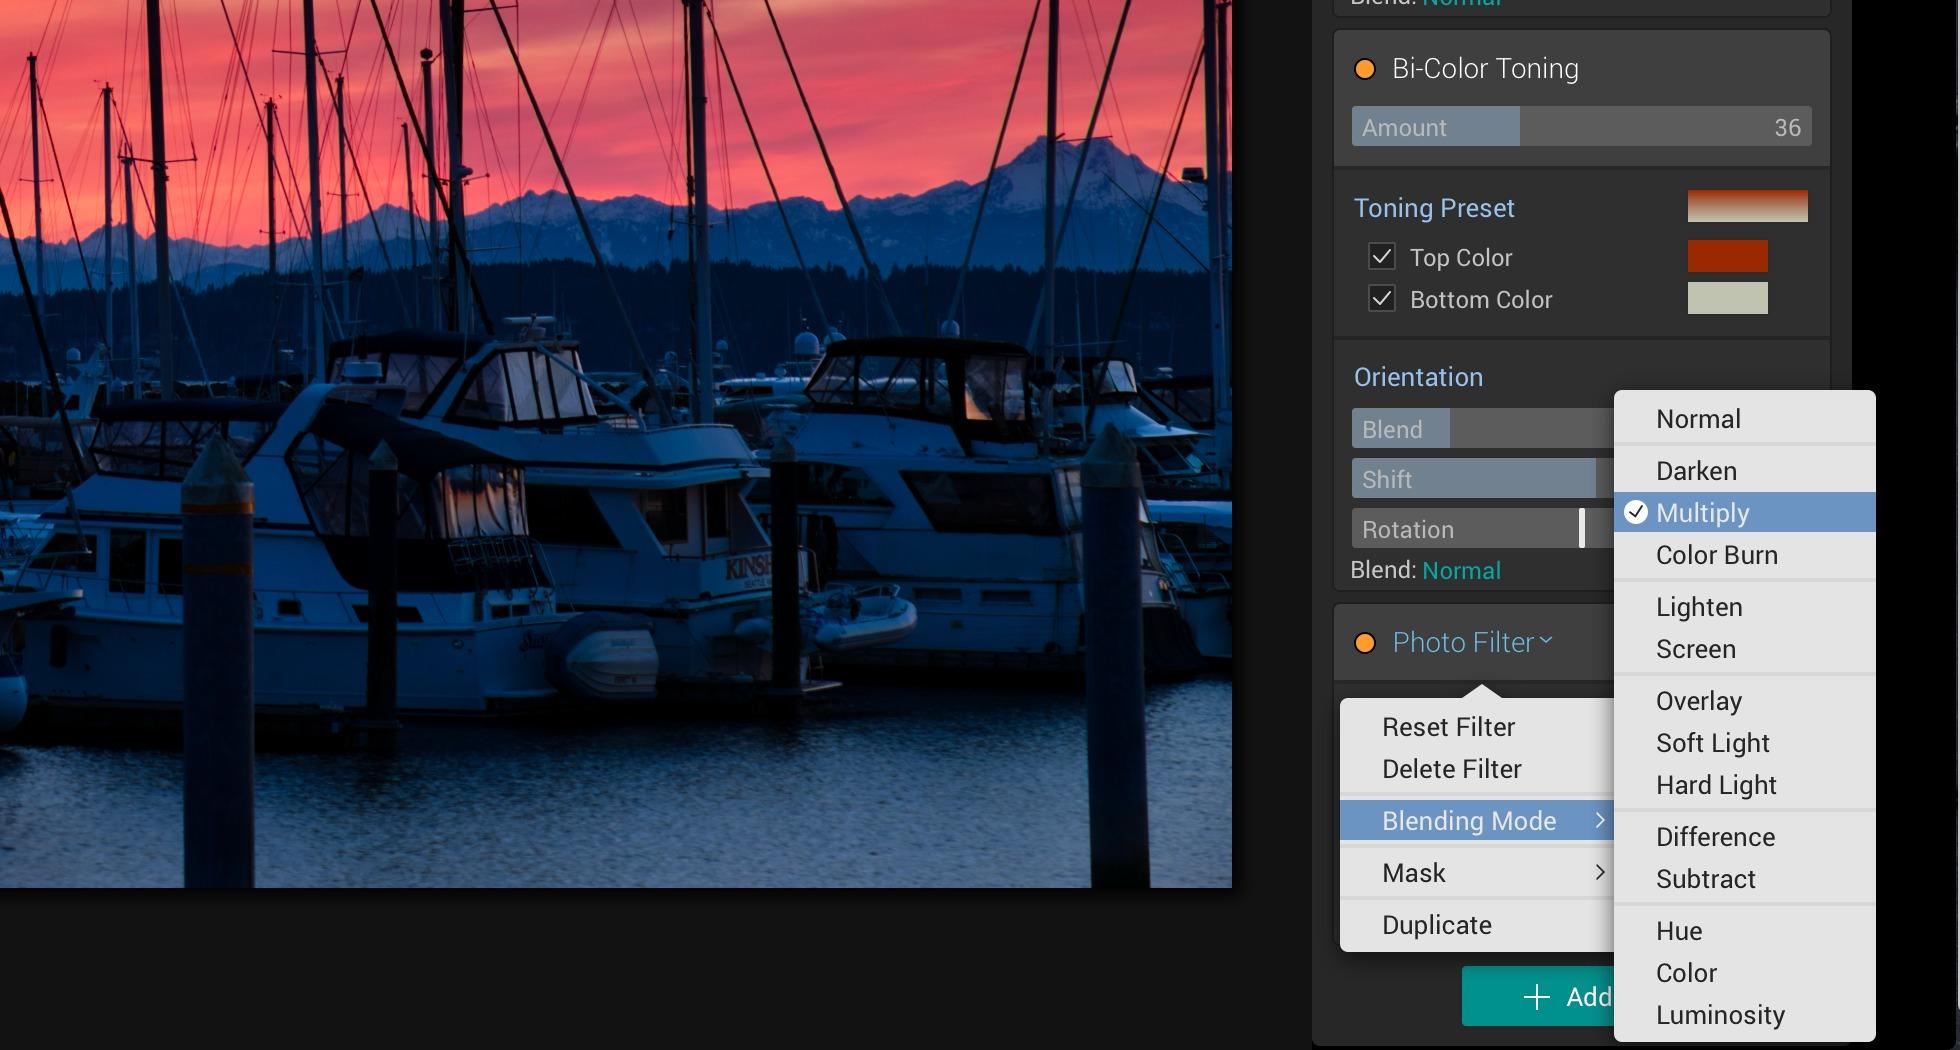 Photo Editing as One with Luminar - TidBITS